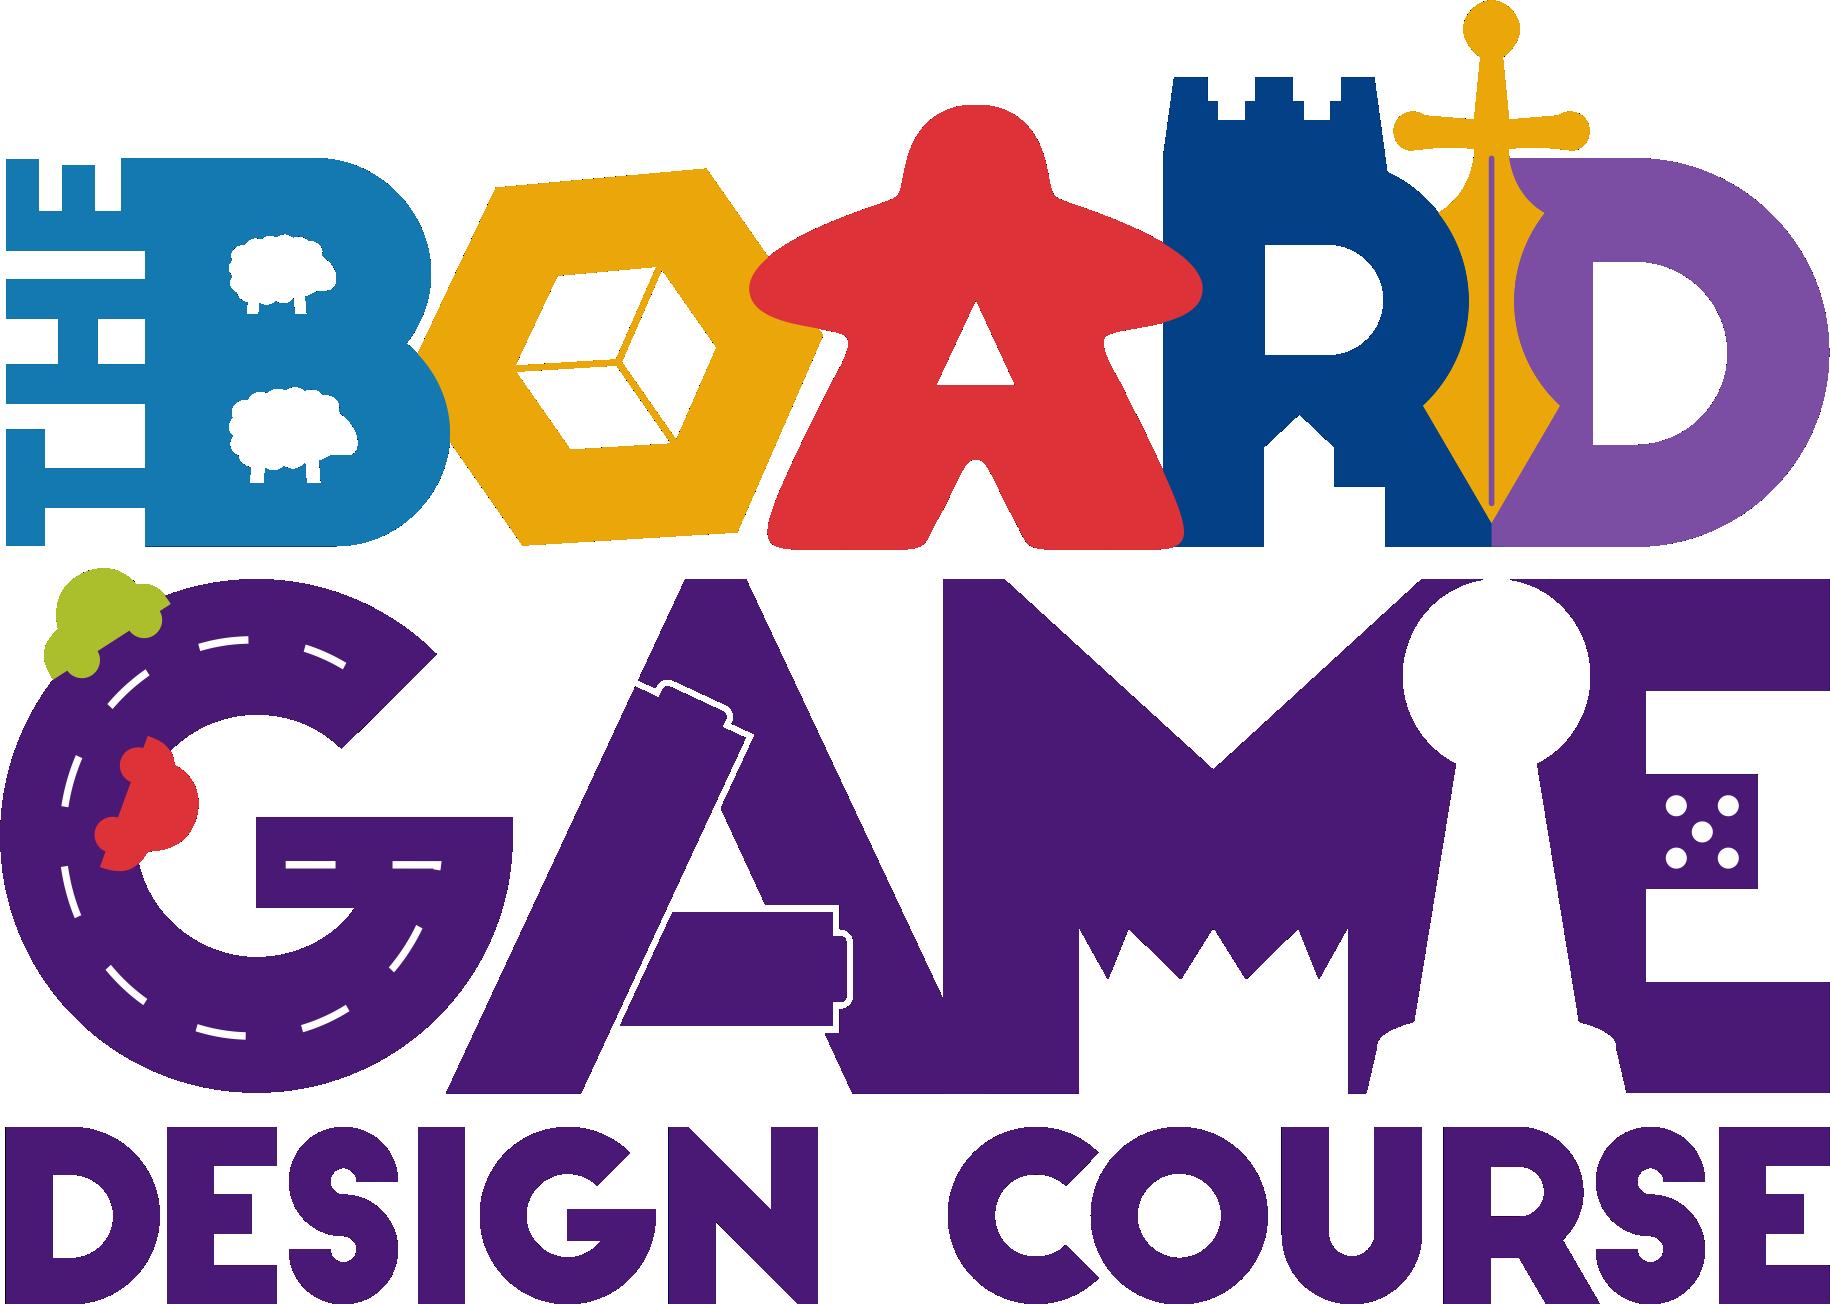 BoardGameDesignCourse-hires-lrg